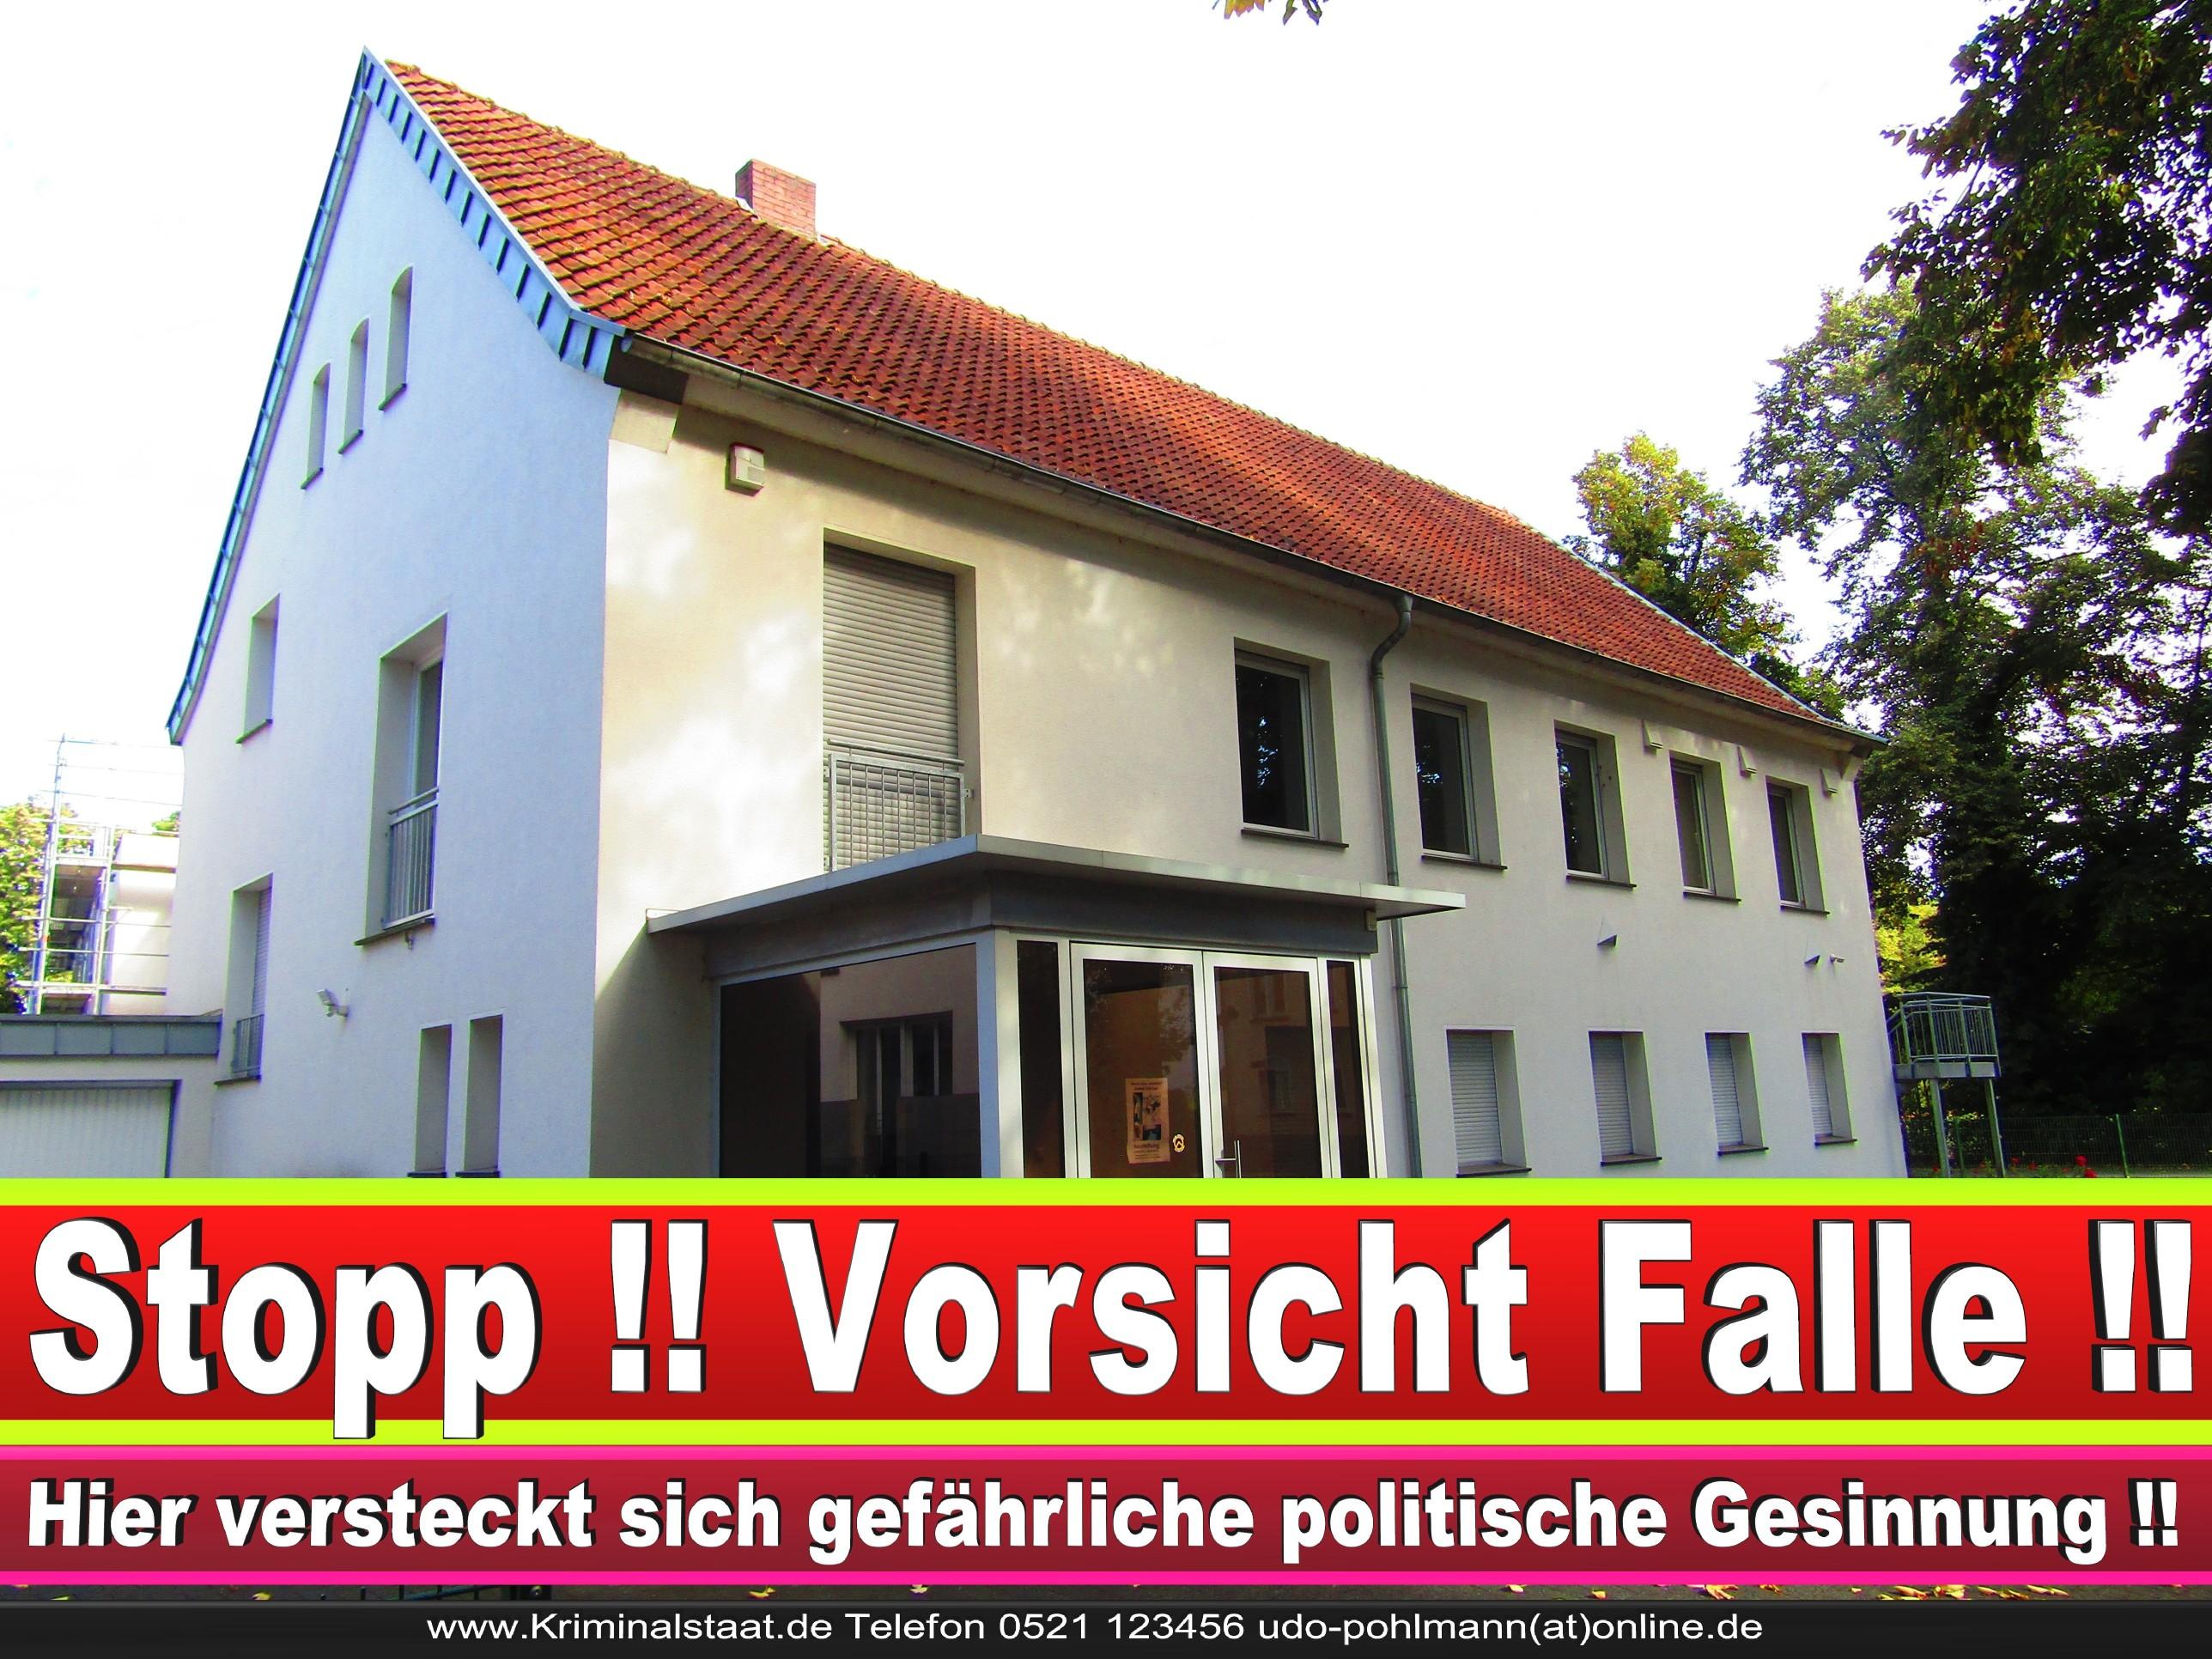 CDU GÜTERSLOH 3 LANDTAGSWAHL BUNDESTAGSWAHL BÜRGERMEISTERWAHL